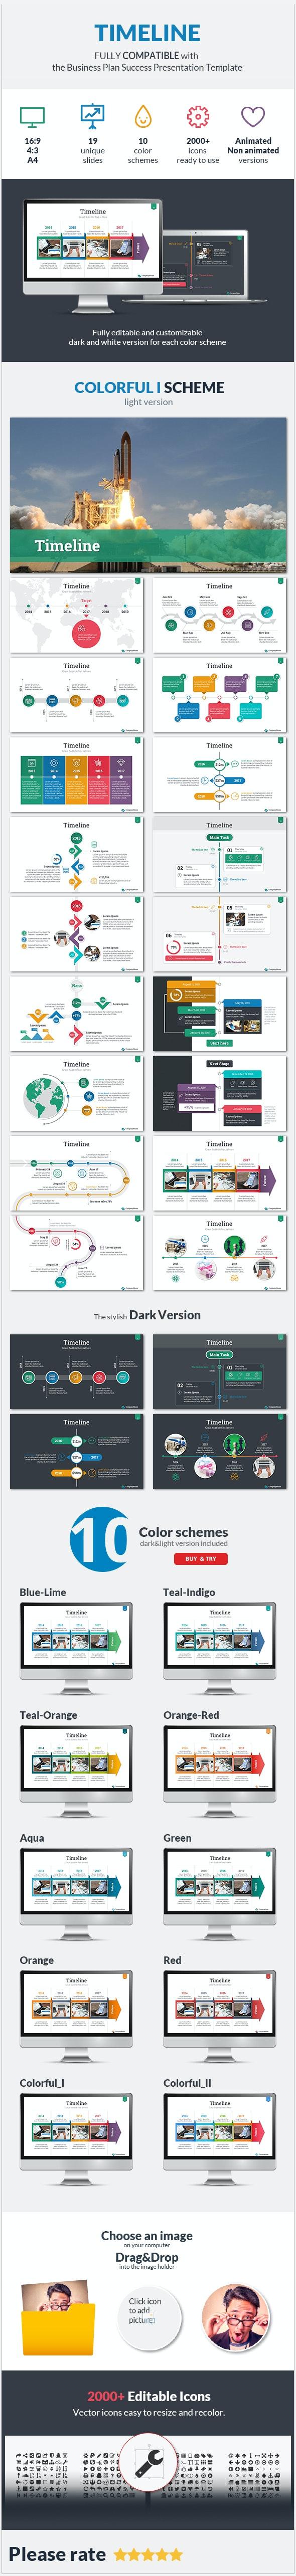 Timeline Success PowerPoint Presentation Template - PowerPoint Templates Presentation Templates